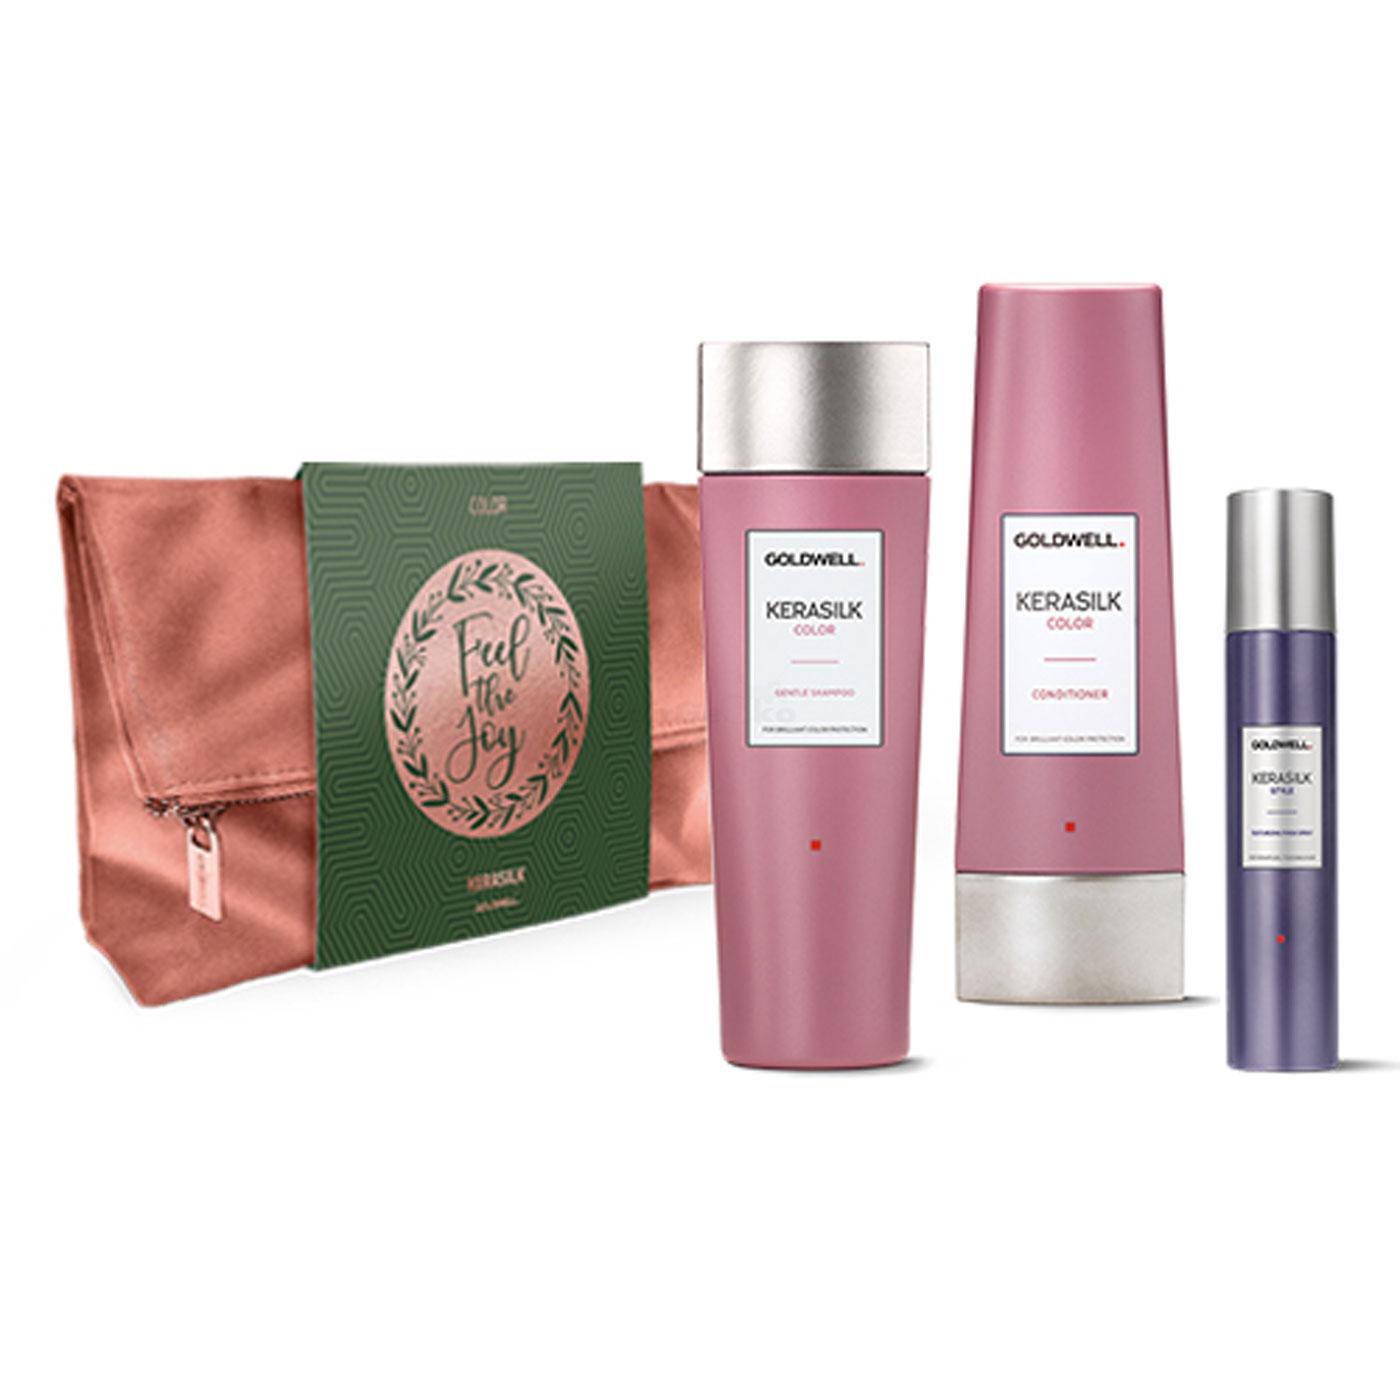 Goldwell Kerasilk Color Xmas Bag Tasche Set - Color Gentle Shampoo 250ml + Color Conditioner 200ml + Style Texture Refresh Spray 75ml